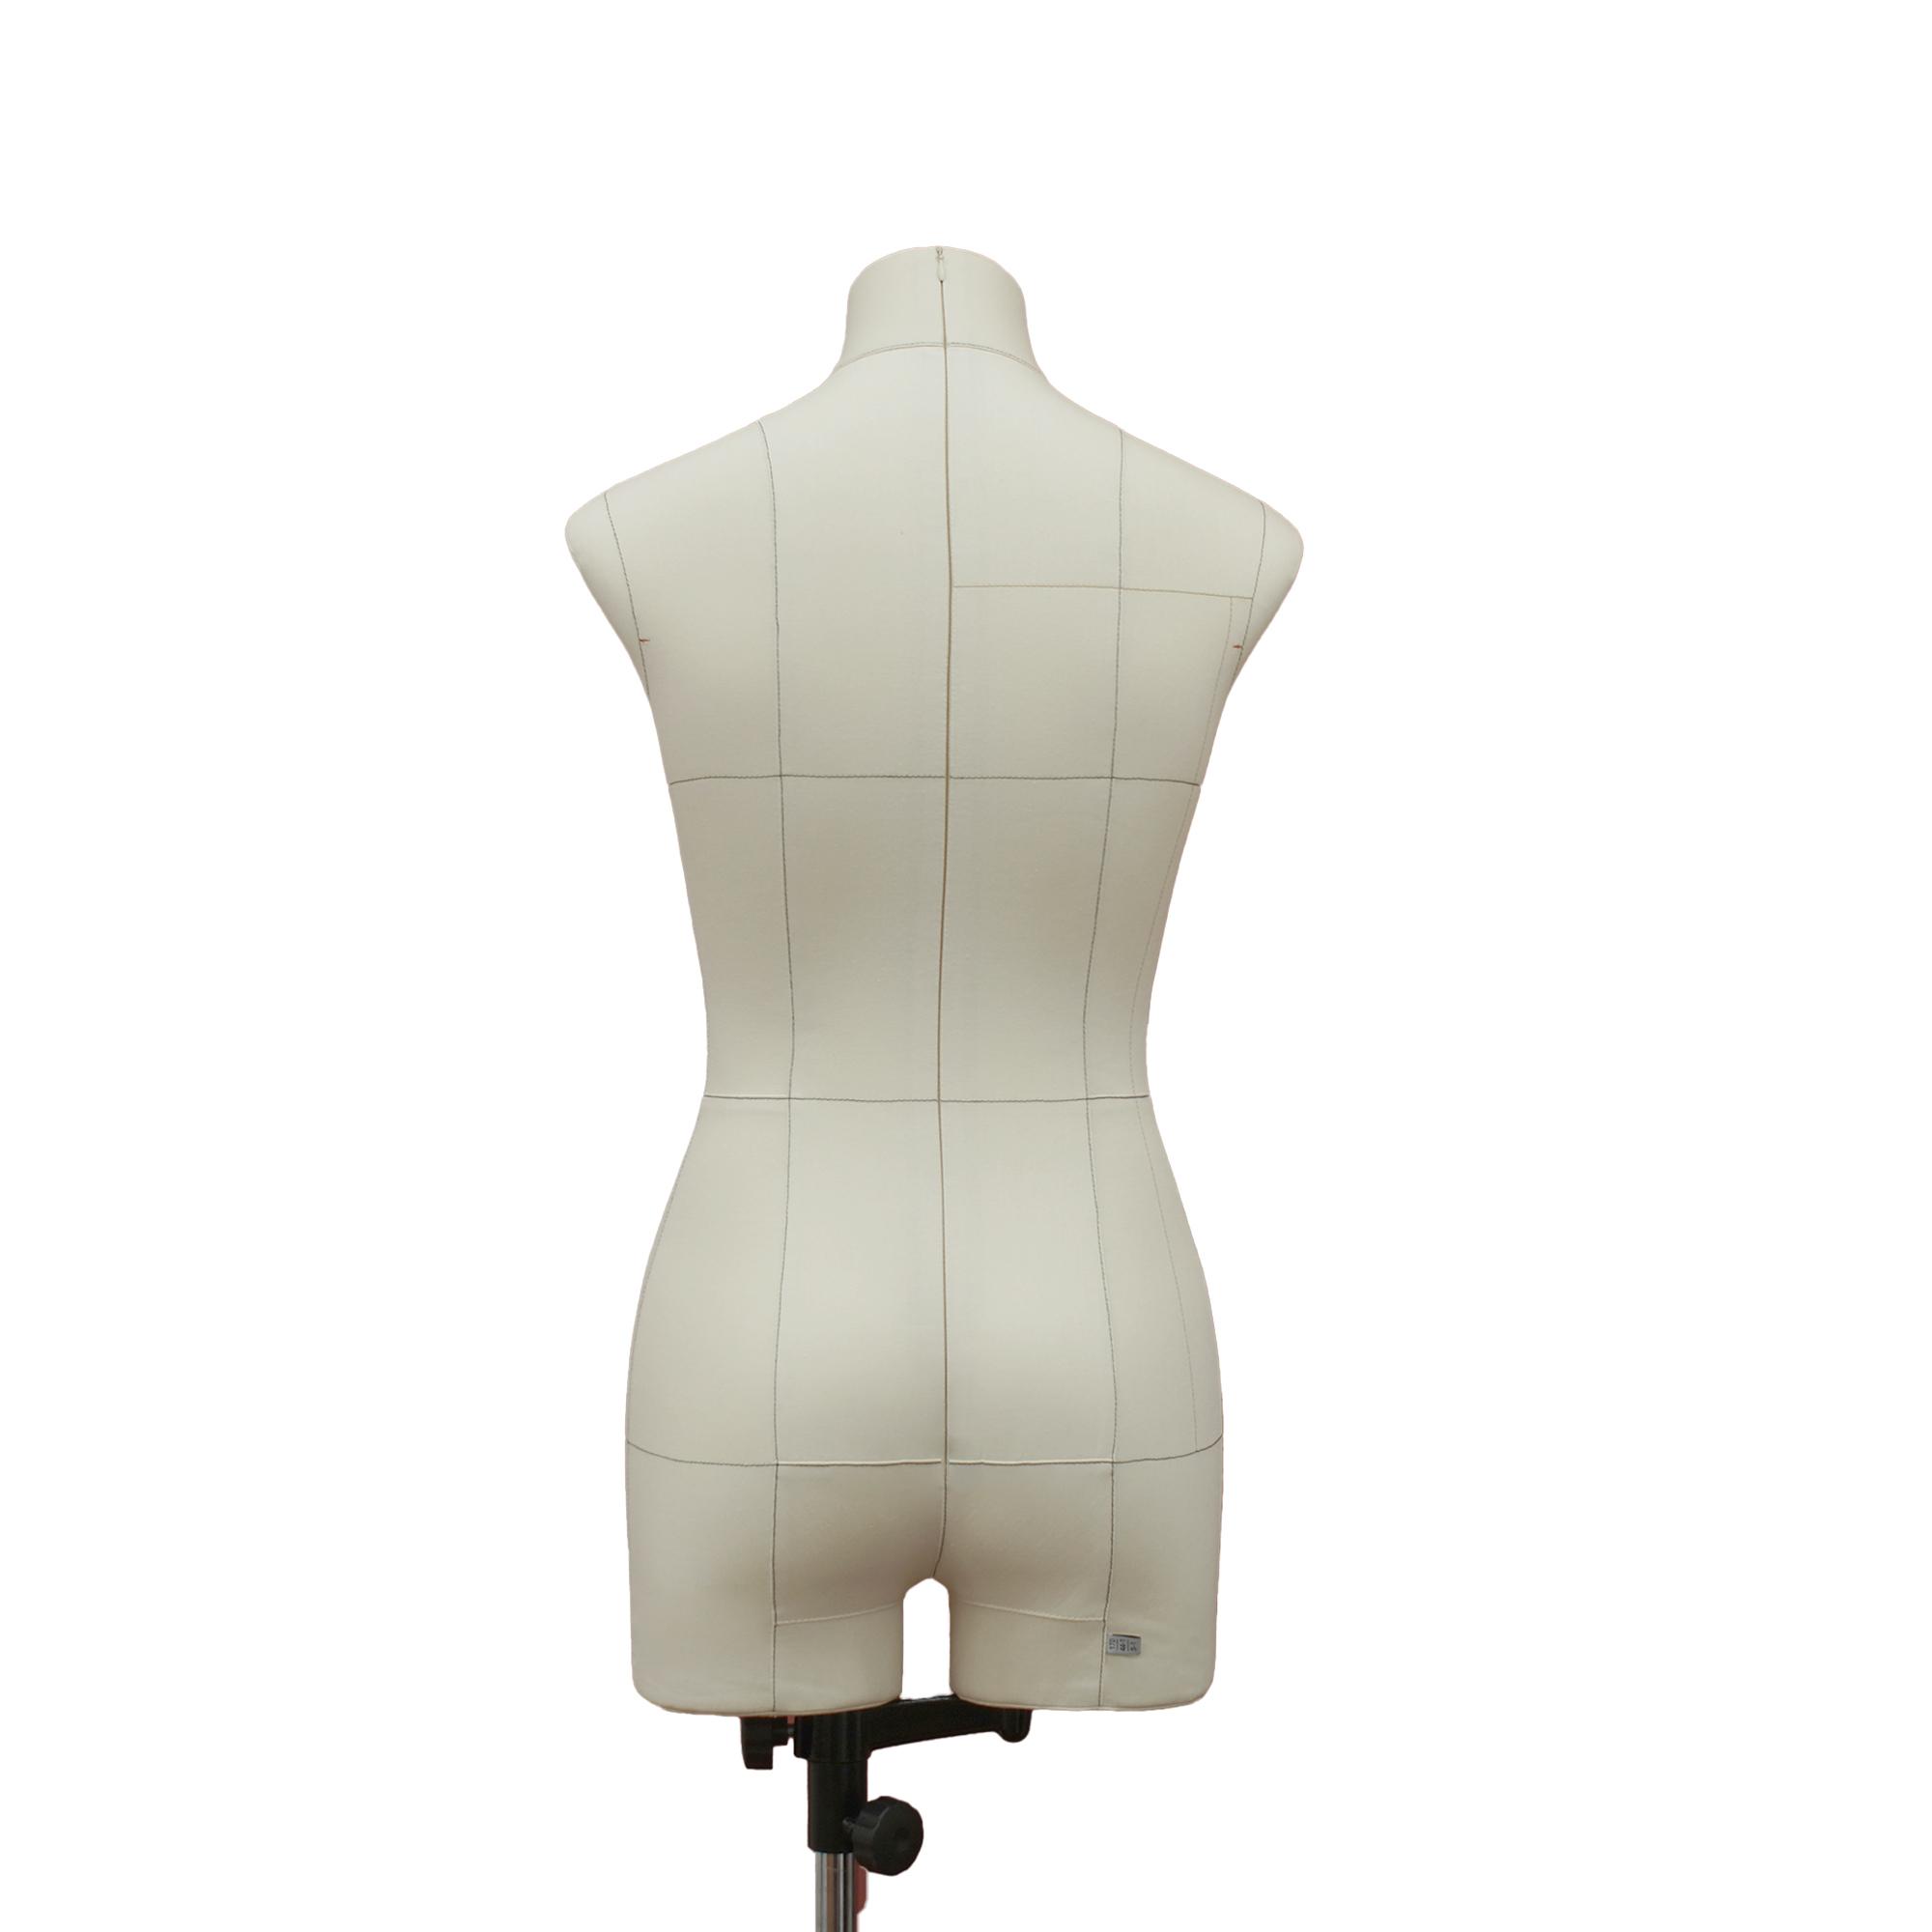 Манекен портновский Моника, комплект Стандарт, размер 44, тип фигуры Прямоугольник, бежевыйФото 1